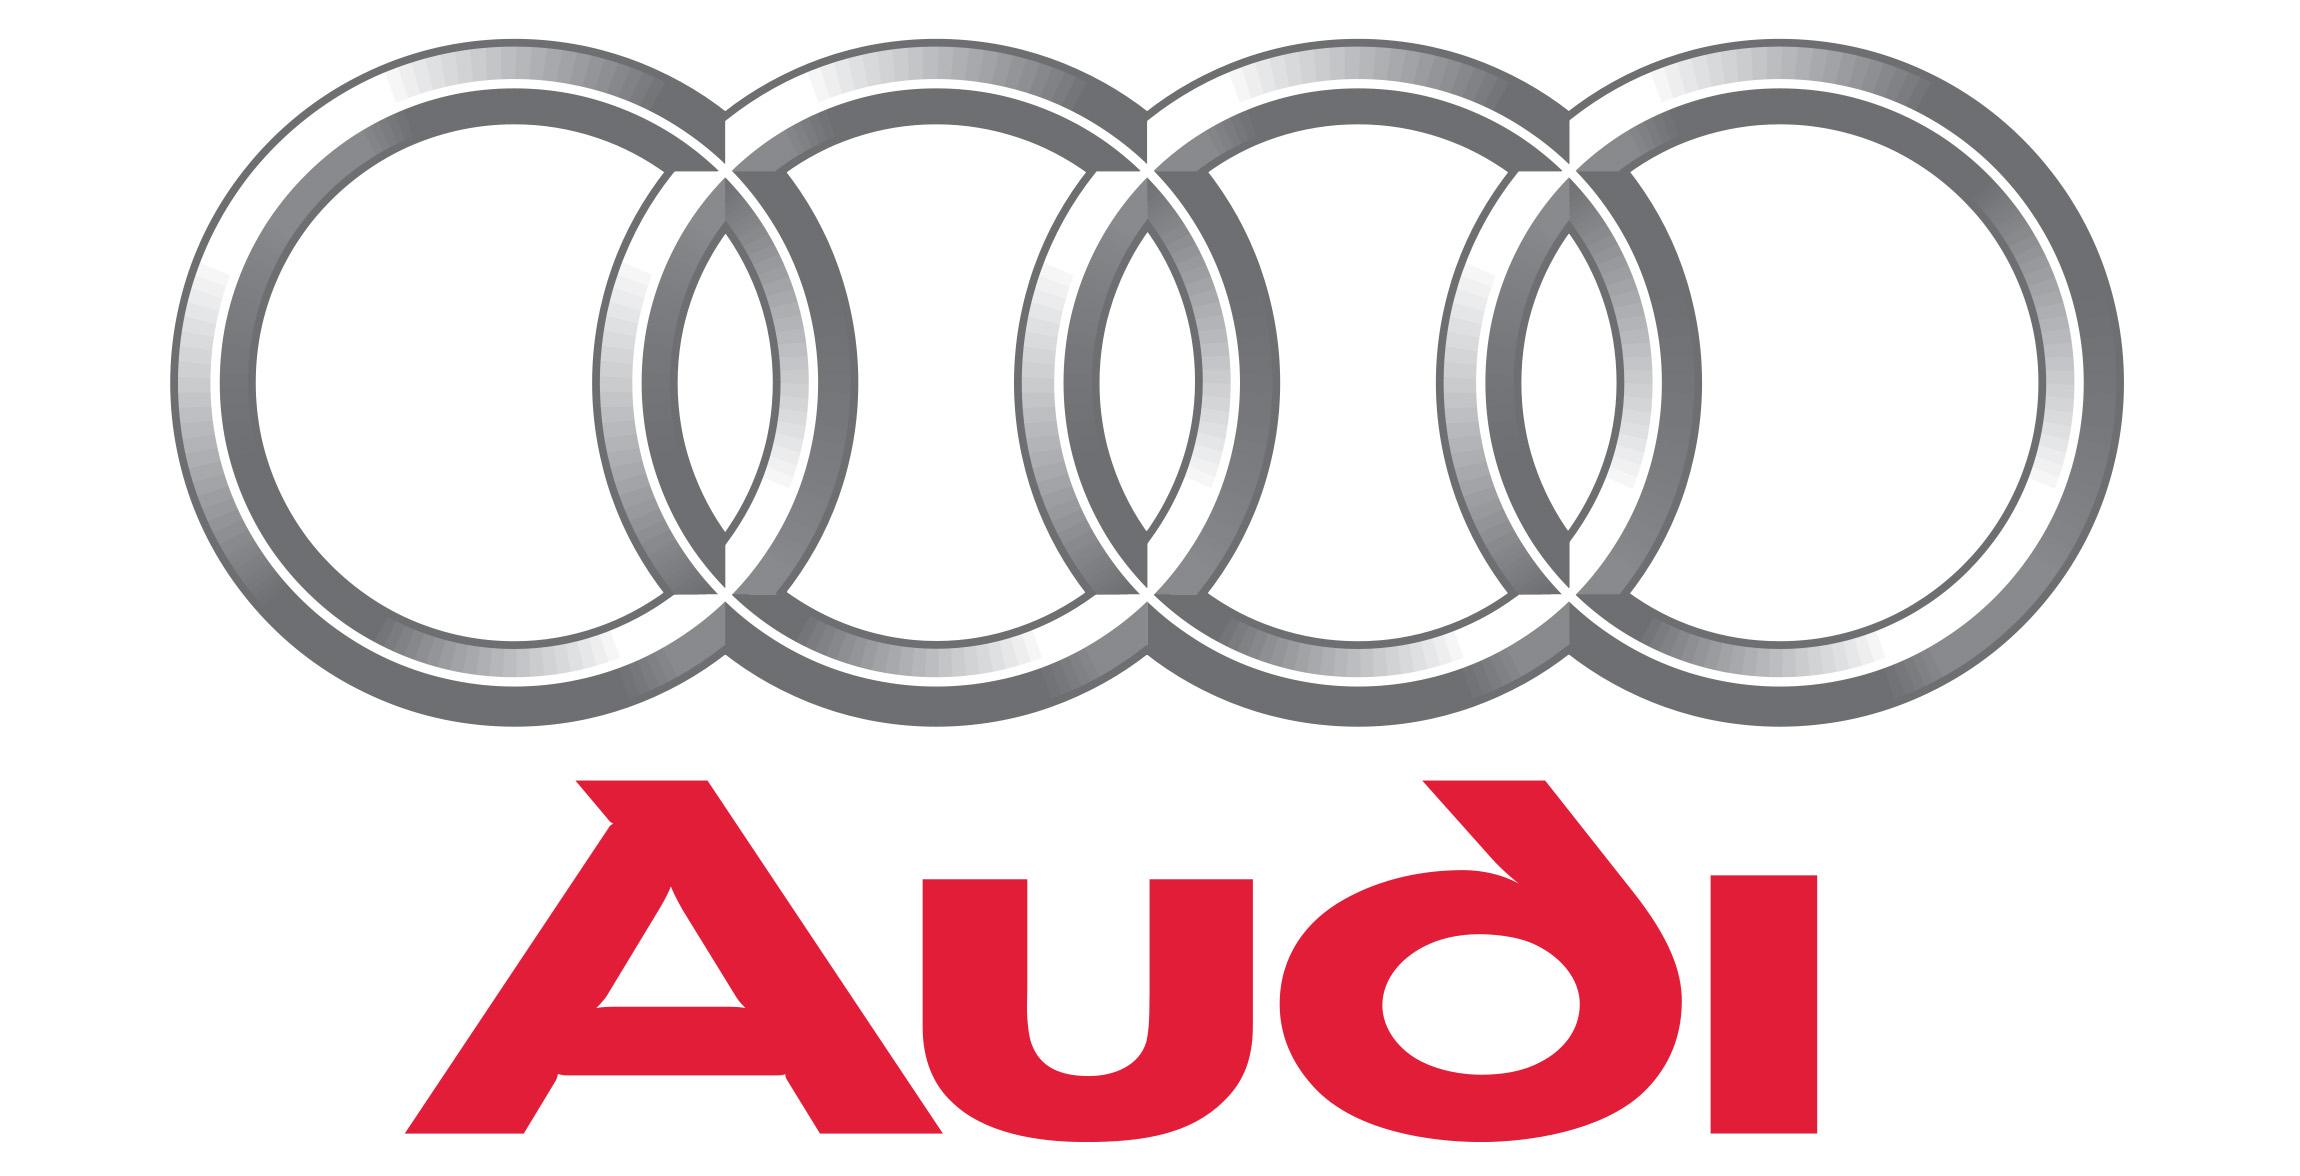 German Car Brands World Cars Brands